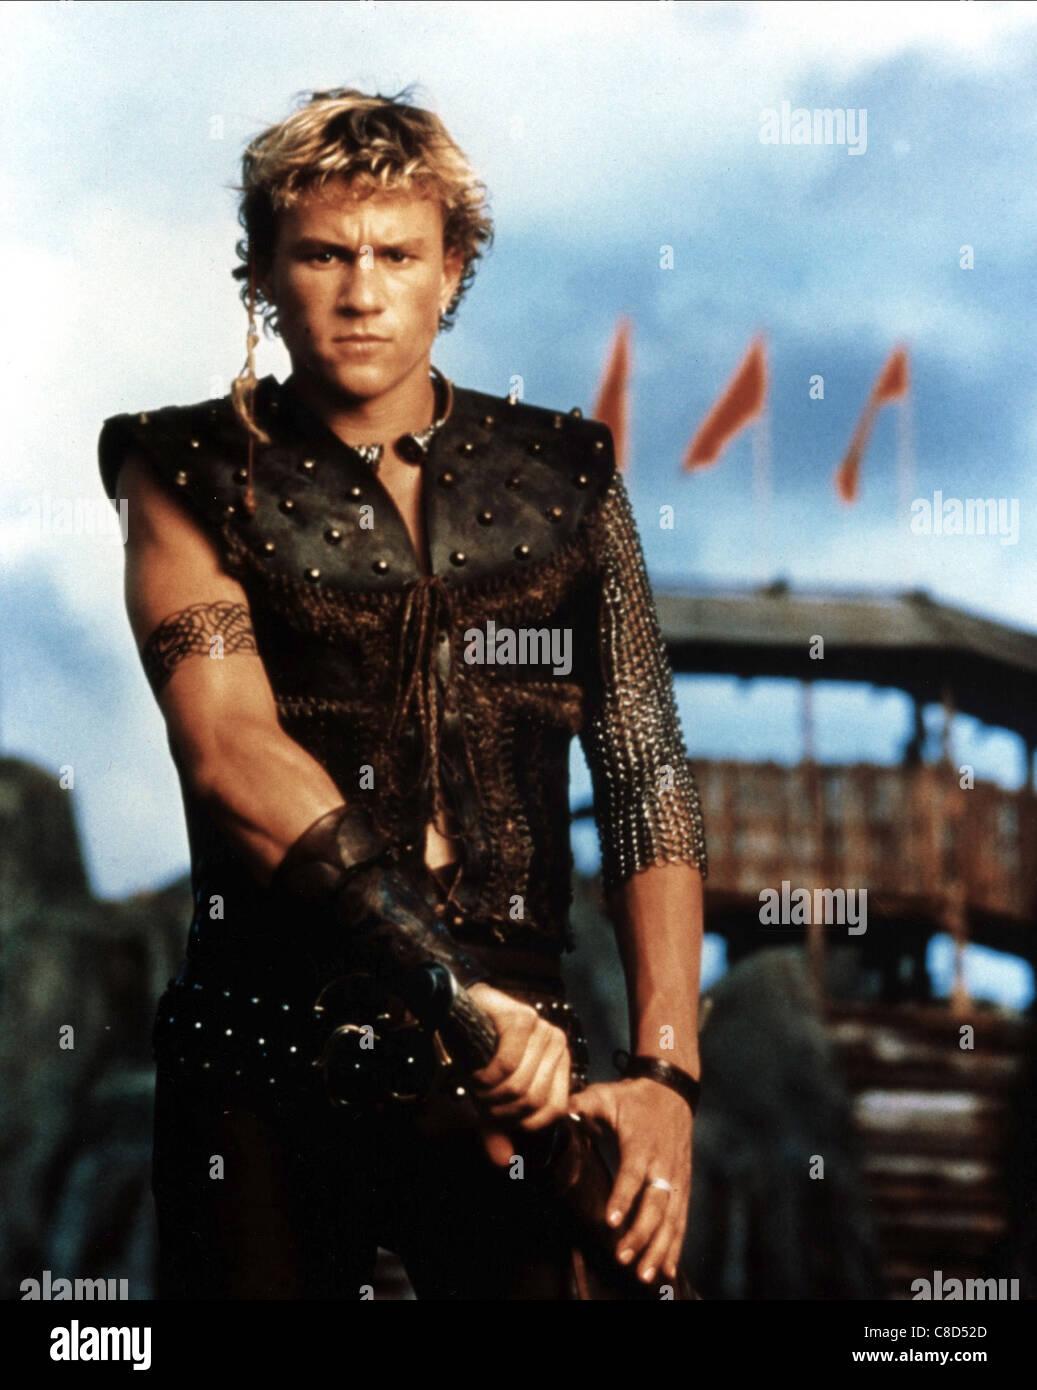 Heath Ledger Roar 1997 Stock Photo 39627349 Alamy